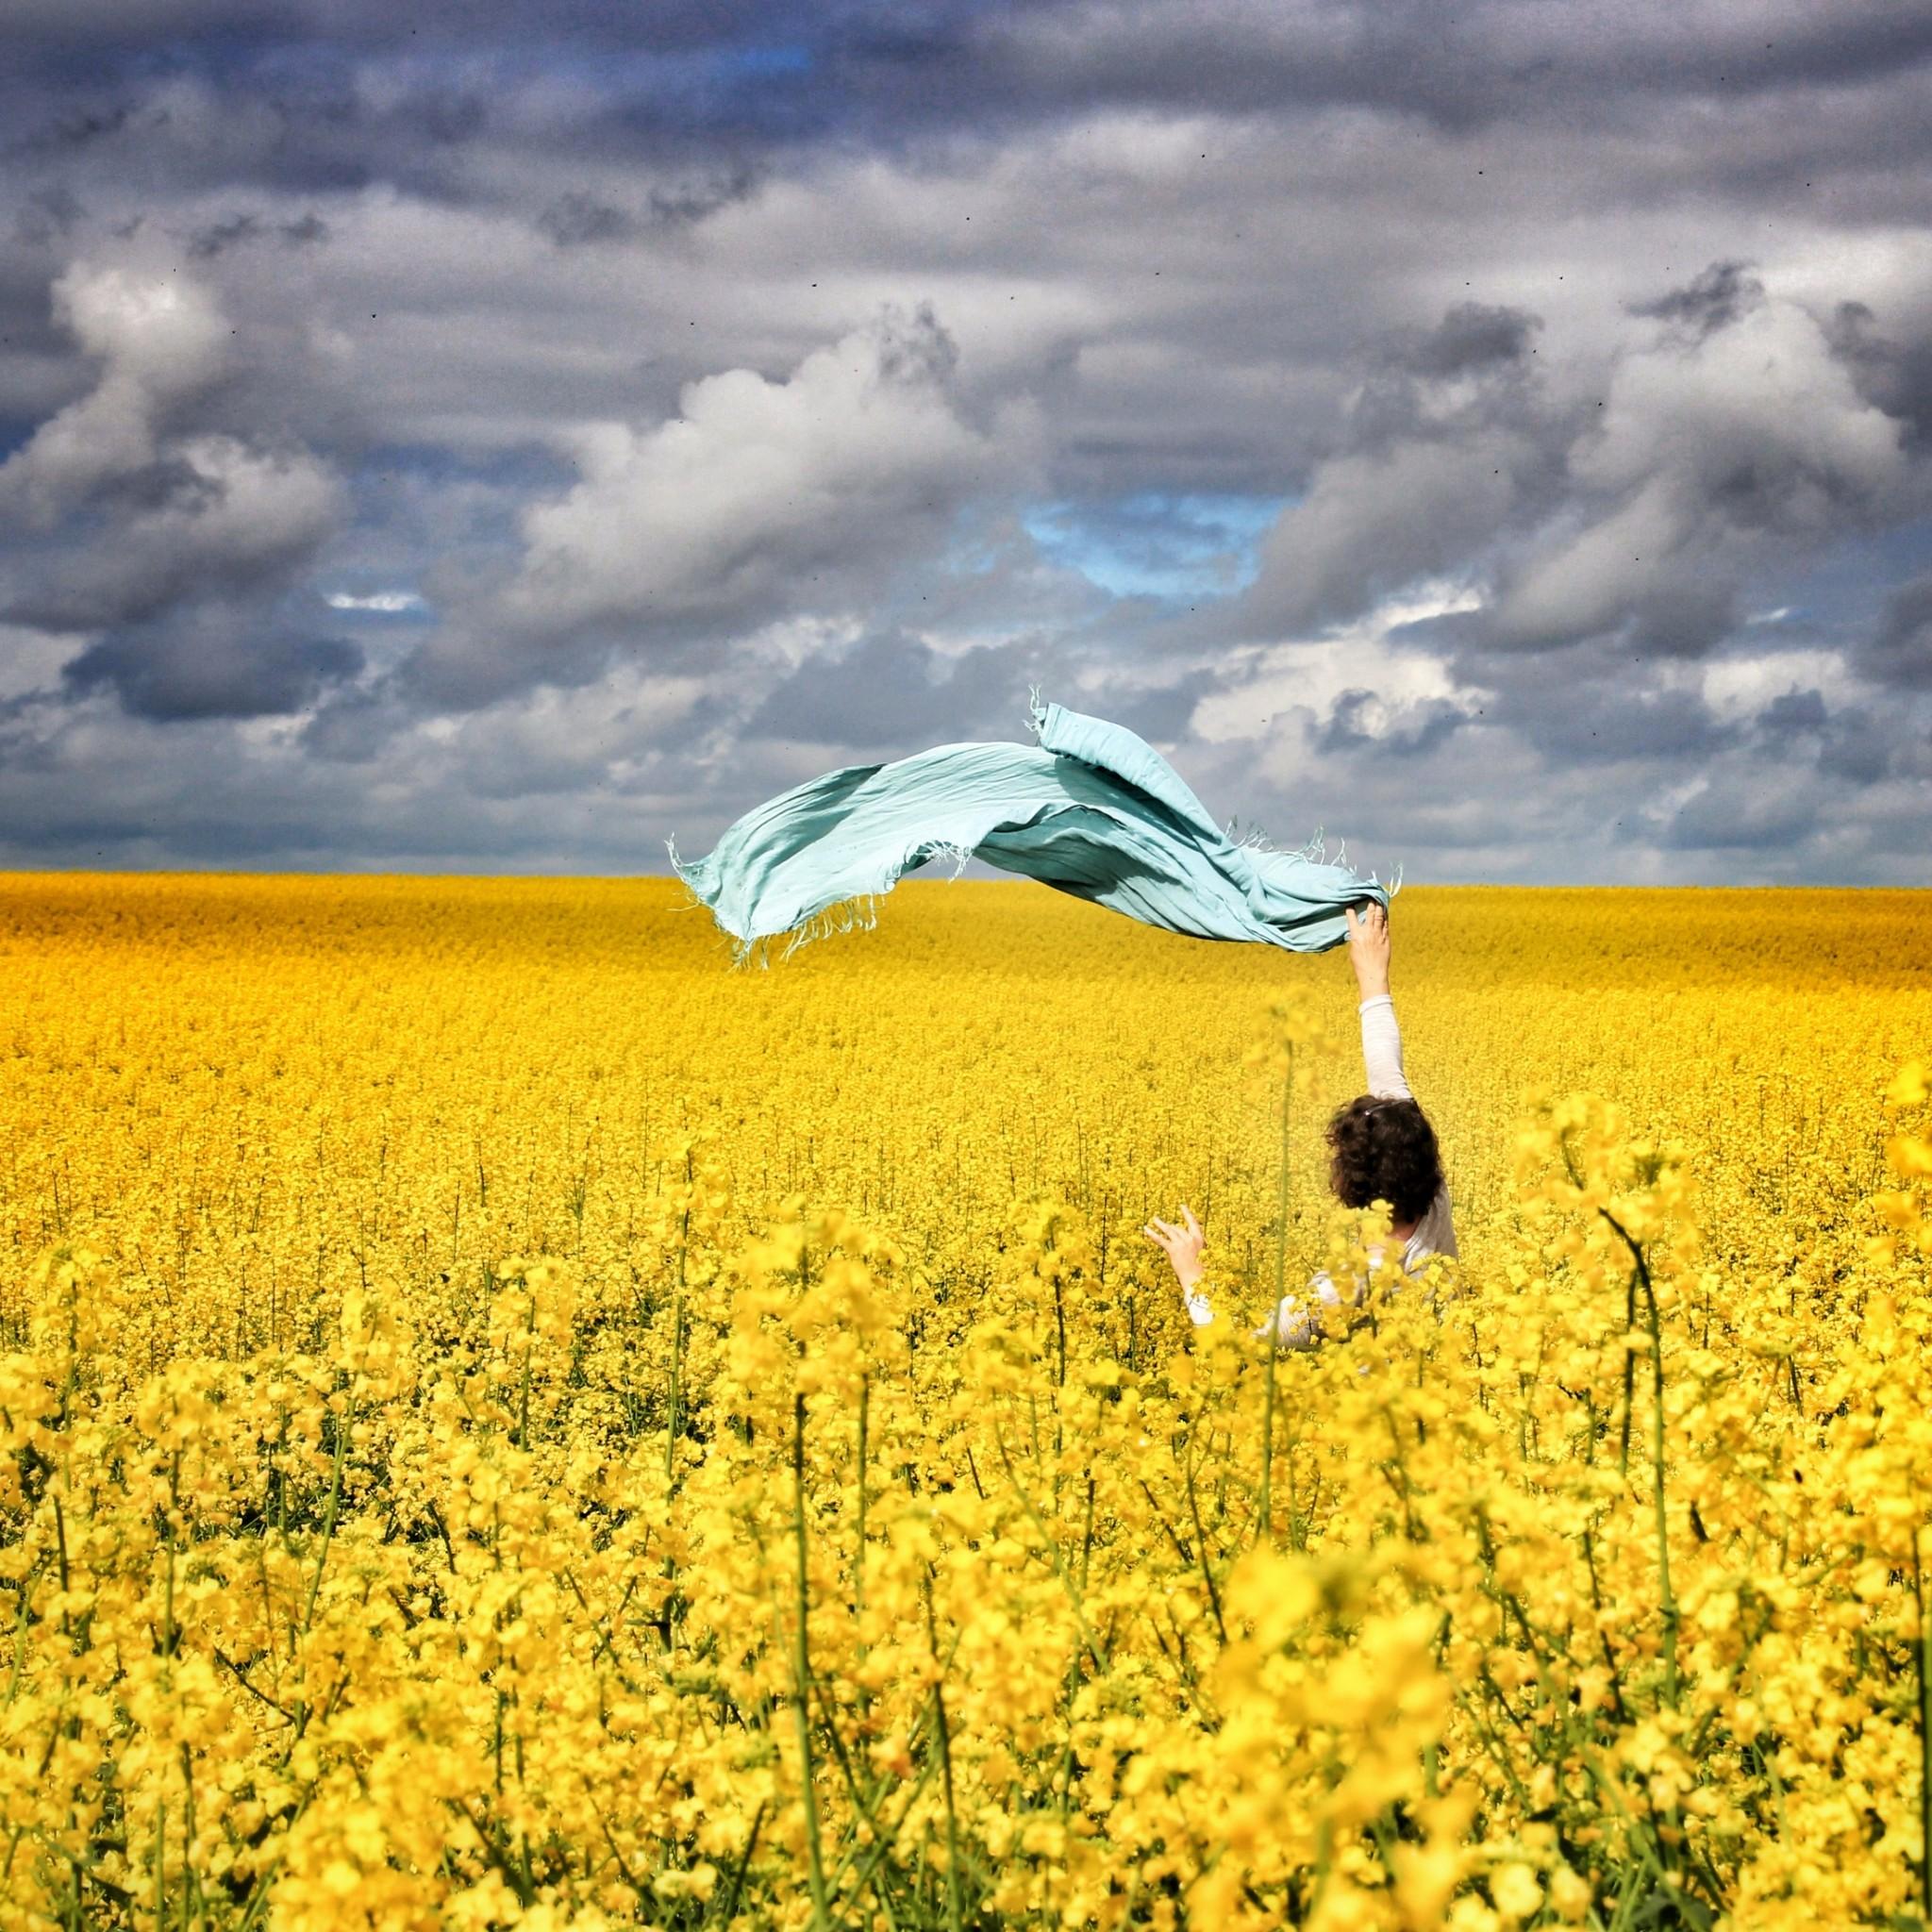 Timbrado et la nature, le champ de colza